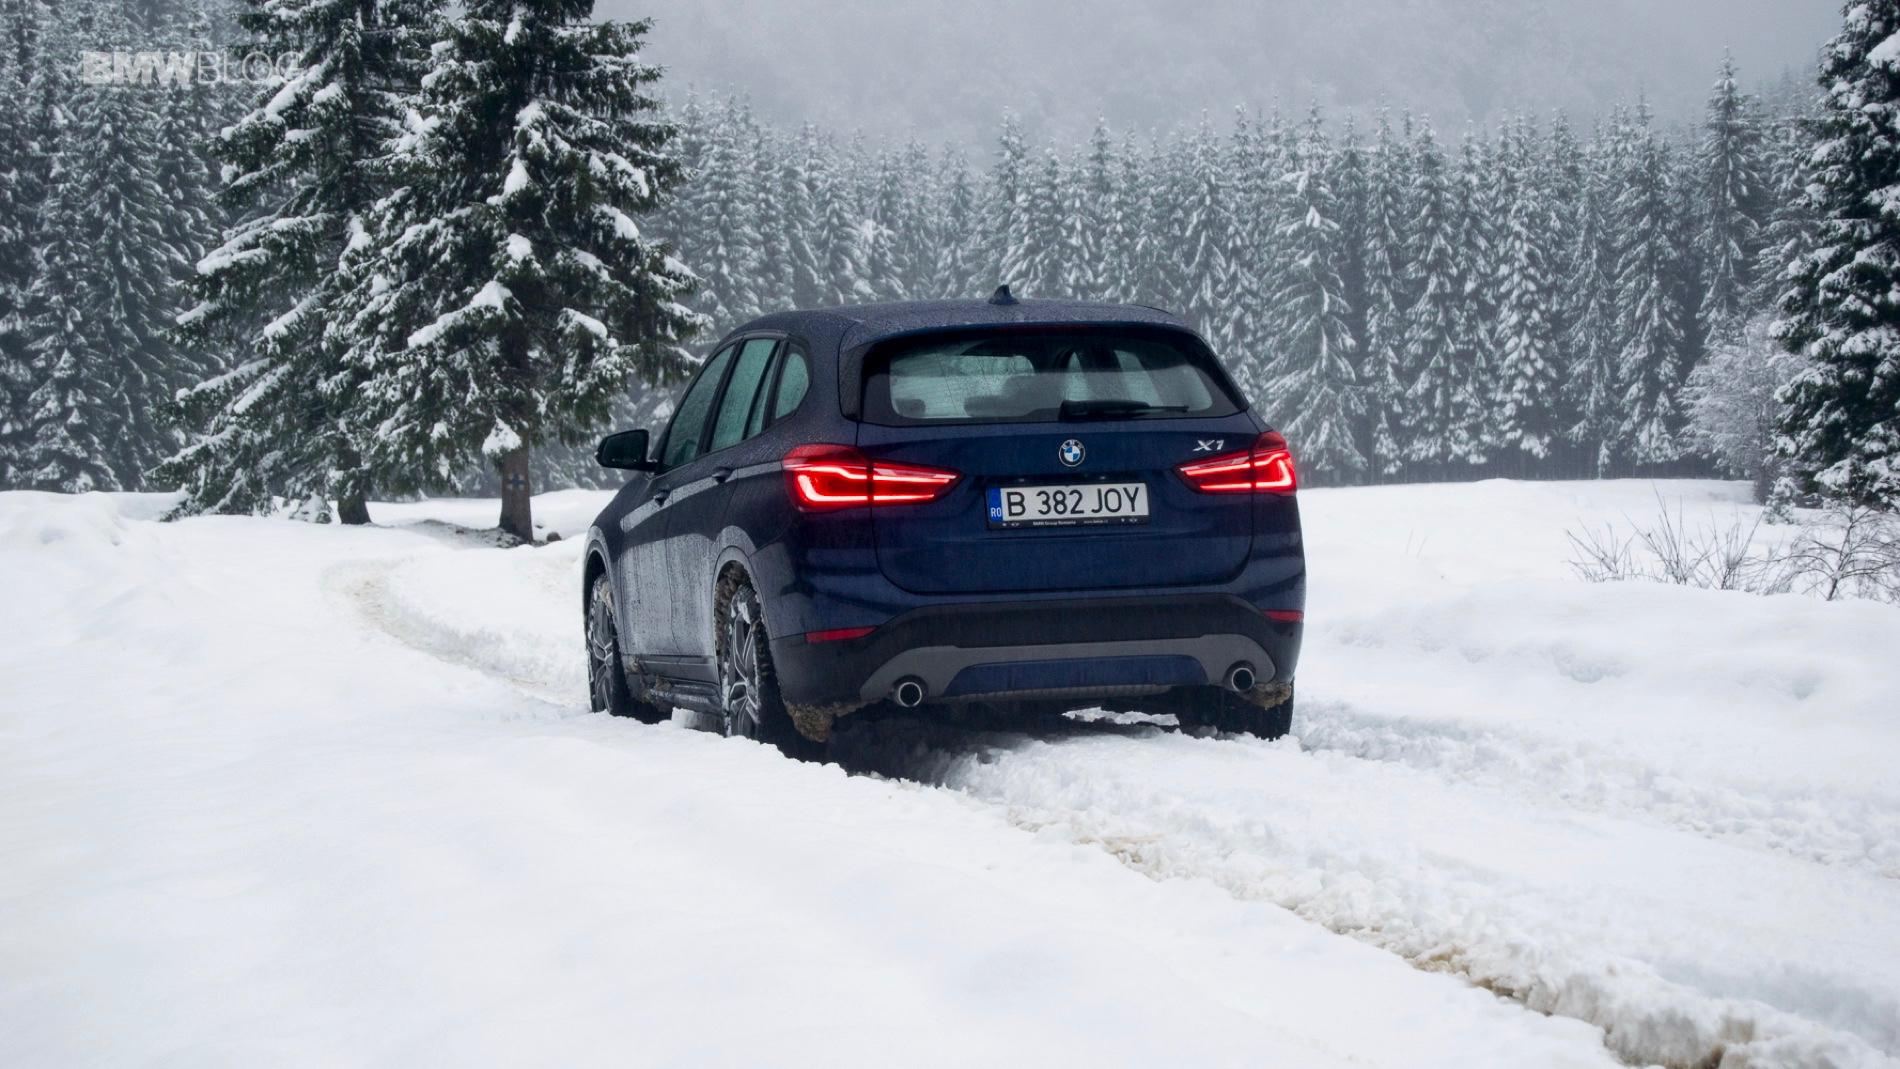 Bmw X3 Snow Tires